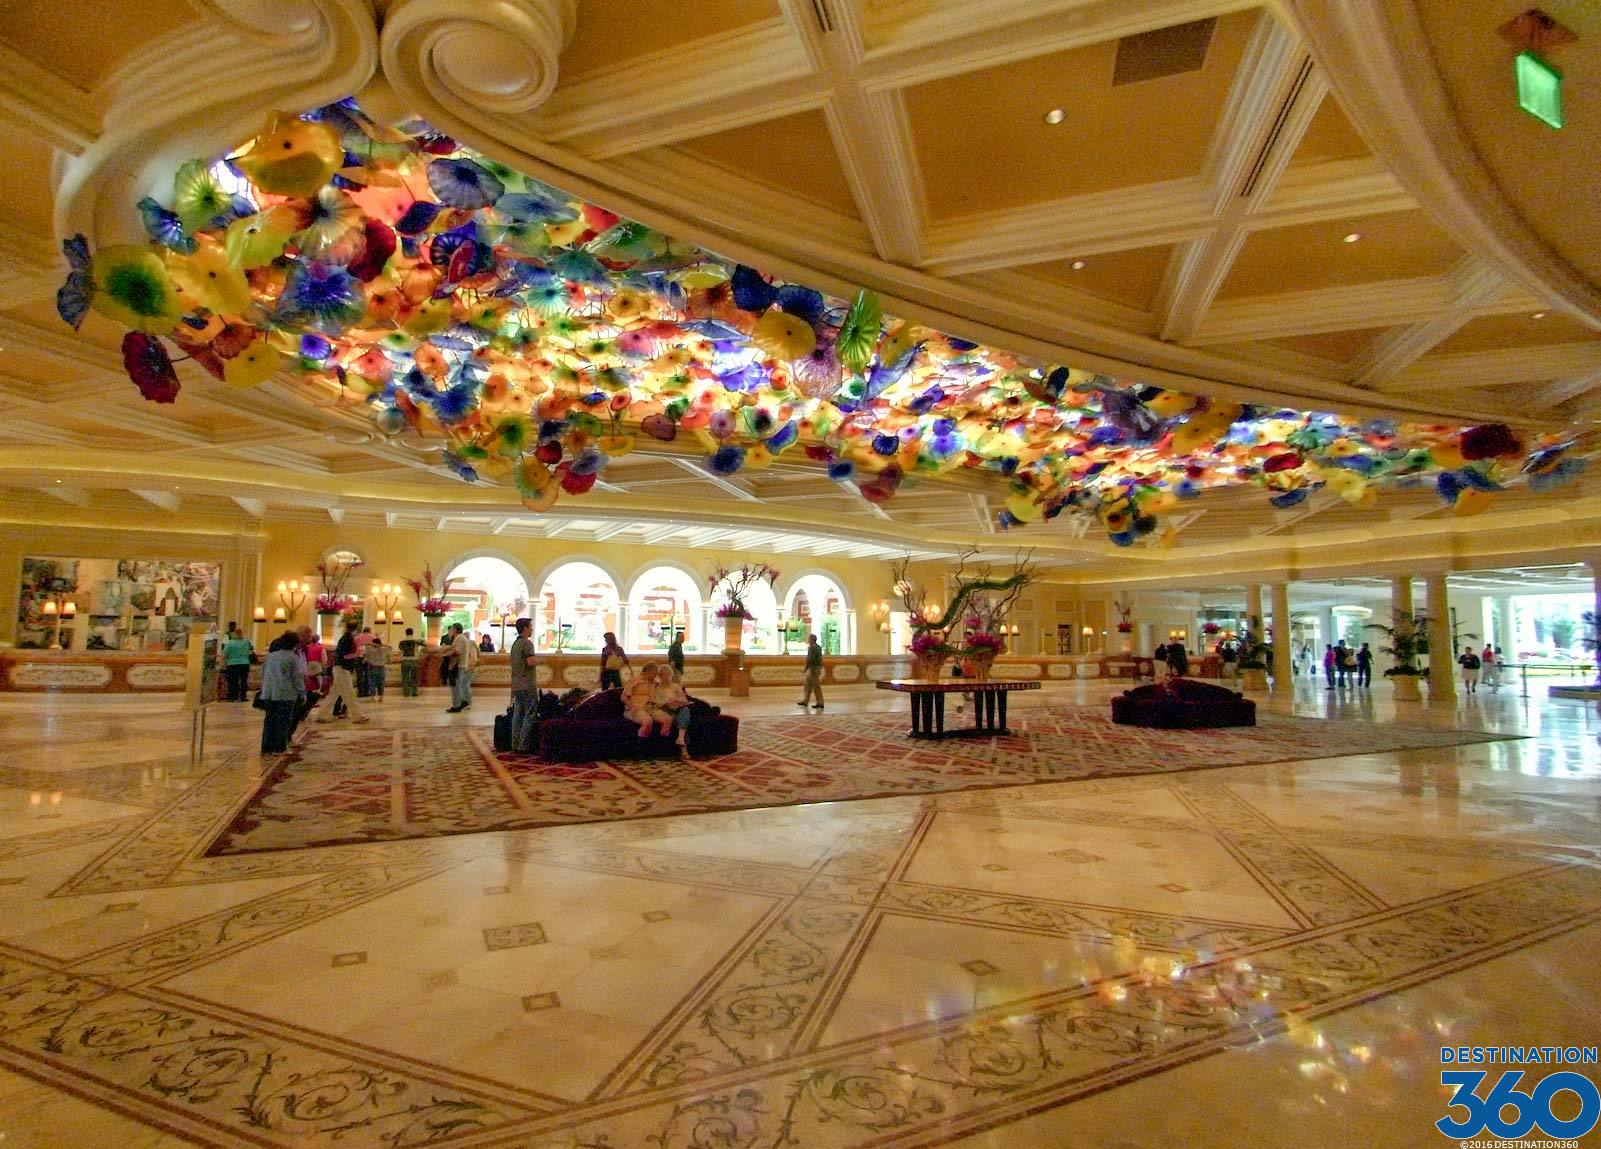 Bellagio Las Vegas - ceiling Murano glass decor - Picture ... |Las Vegas Bellagio Hotel Lobby